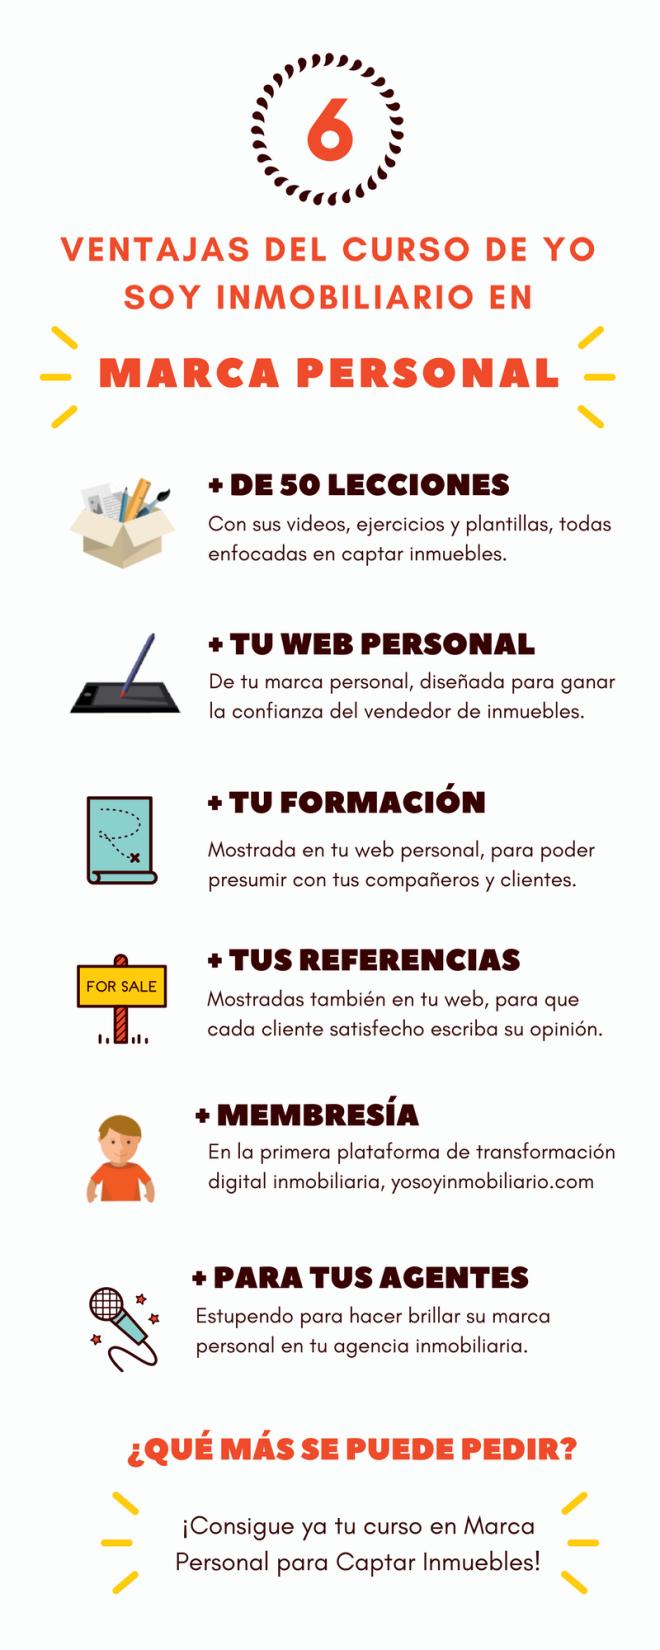 Infografia ventajas curso marca personal